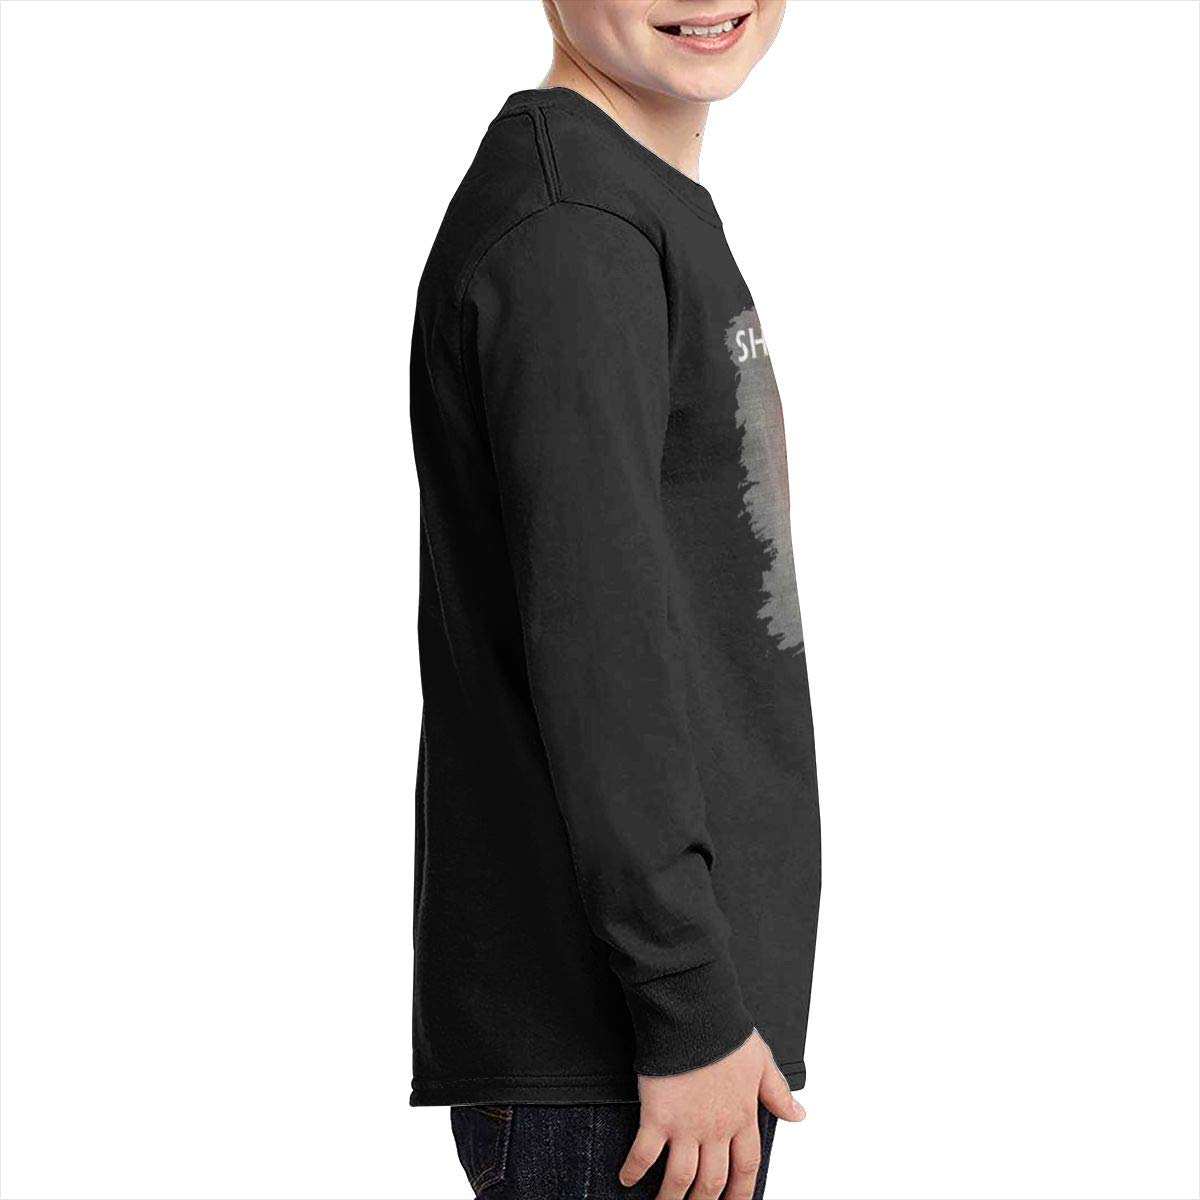 Optumus Shinedown Kids Sweatshirts Long Sleeve T Shirt Boy Girl Children Teenagers Unisex Tee